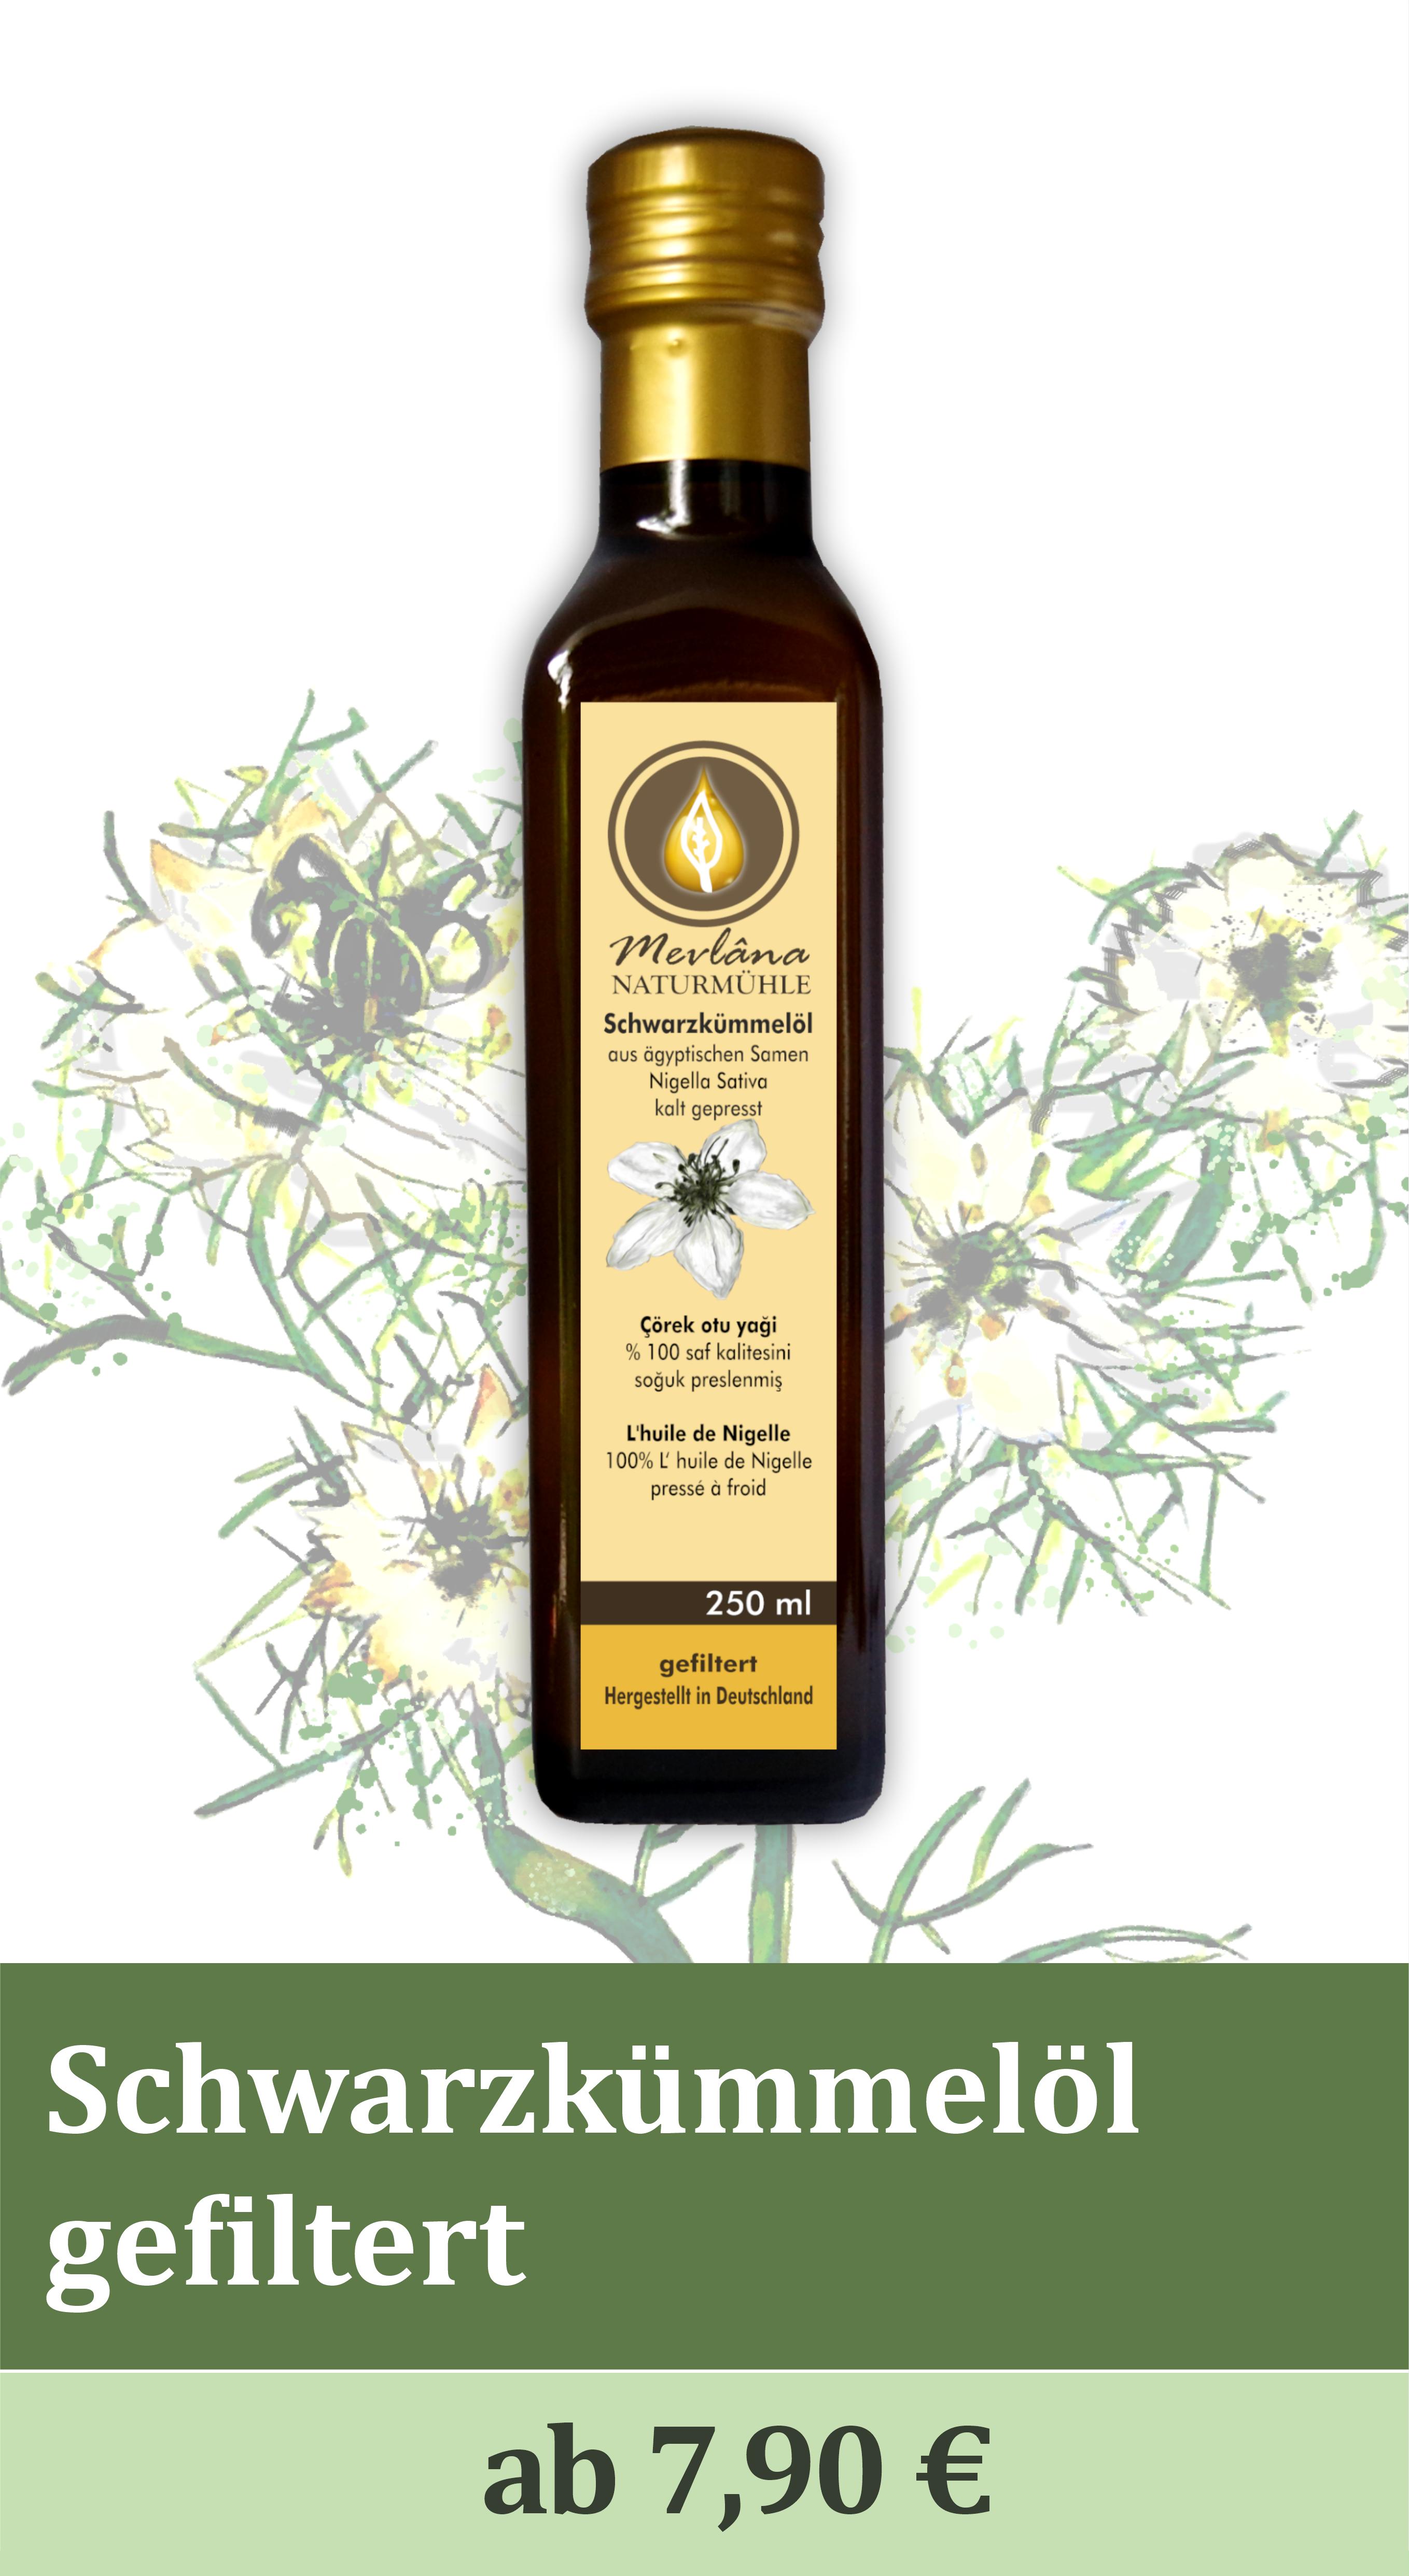 Schwarzkümmelöl gefiltert, Schwarzkümmelöl ungefiltert, kaltgepresst, 100%, nigella sativa, Kräuterölmühle, Ölmühle, Naturmühle, mühlenfrisch, Kümmelöl, naturbelassen, Rohkostqualität